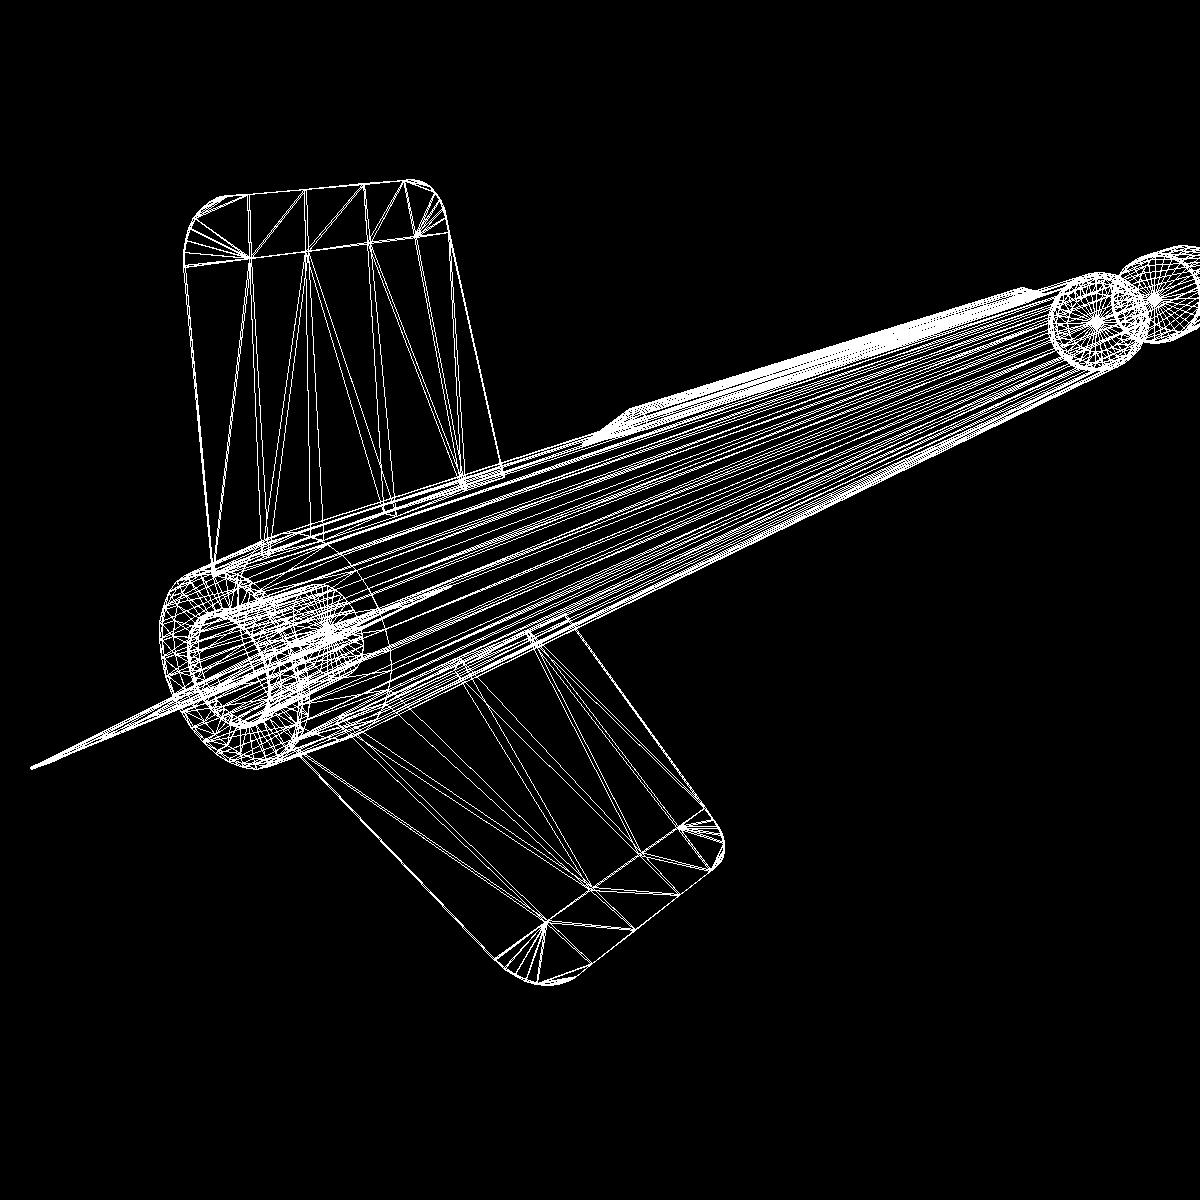 us wac corporal rocket 3d model 3ds dxf x cod scn obj 149637